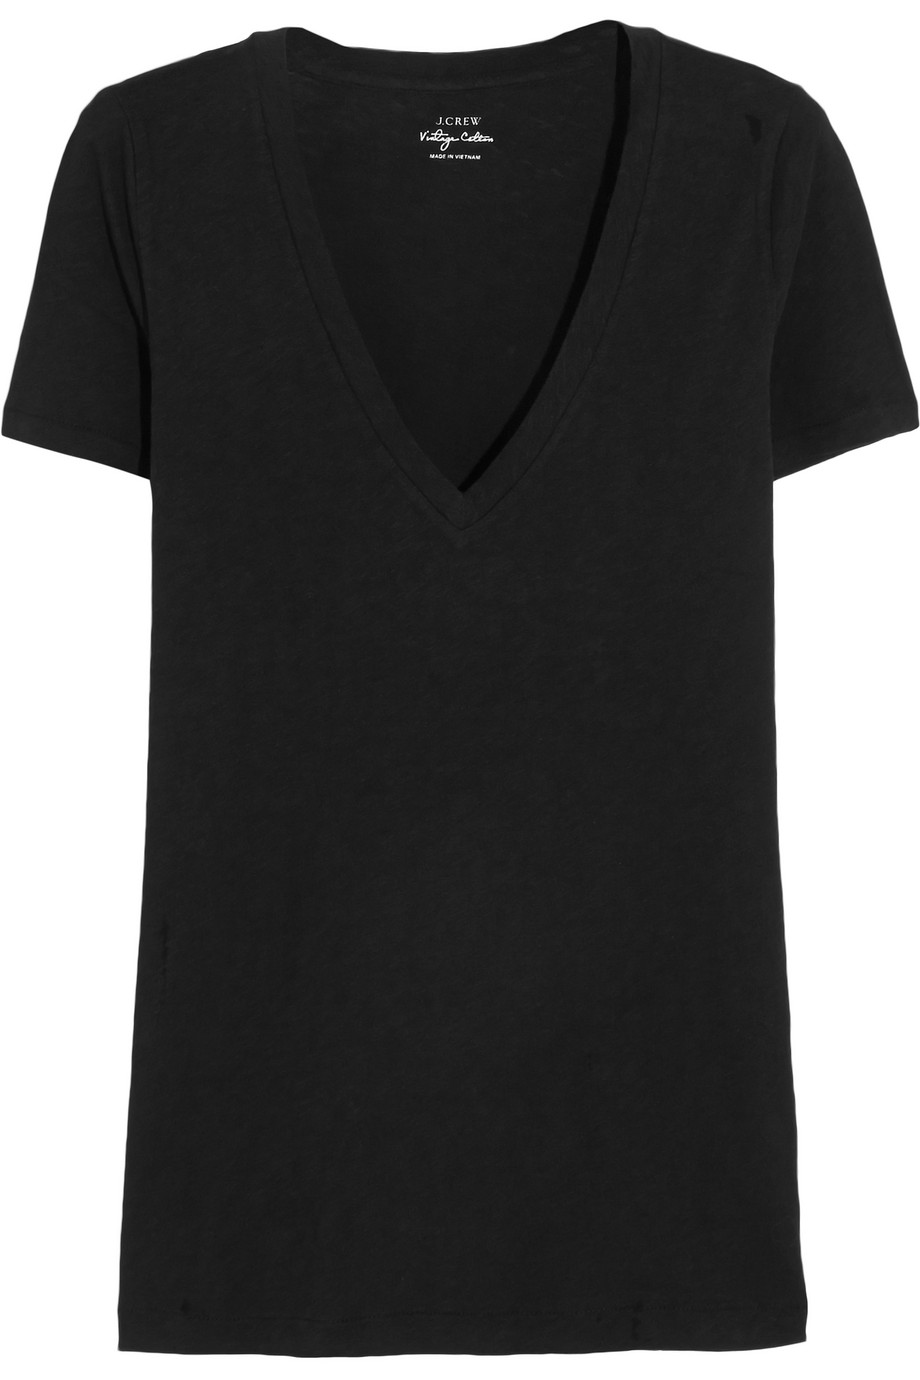 J.Crew Vintage Cotton-Jersey T-Shirt, Black, Women's, Size: XL